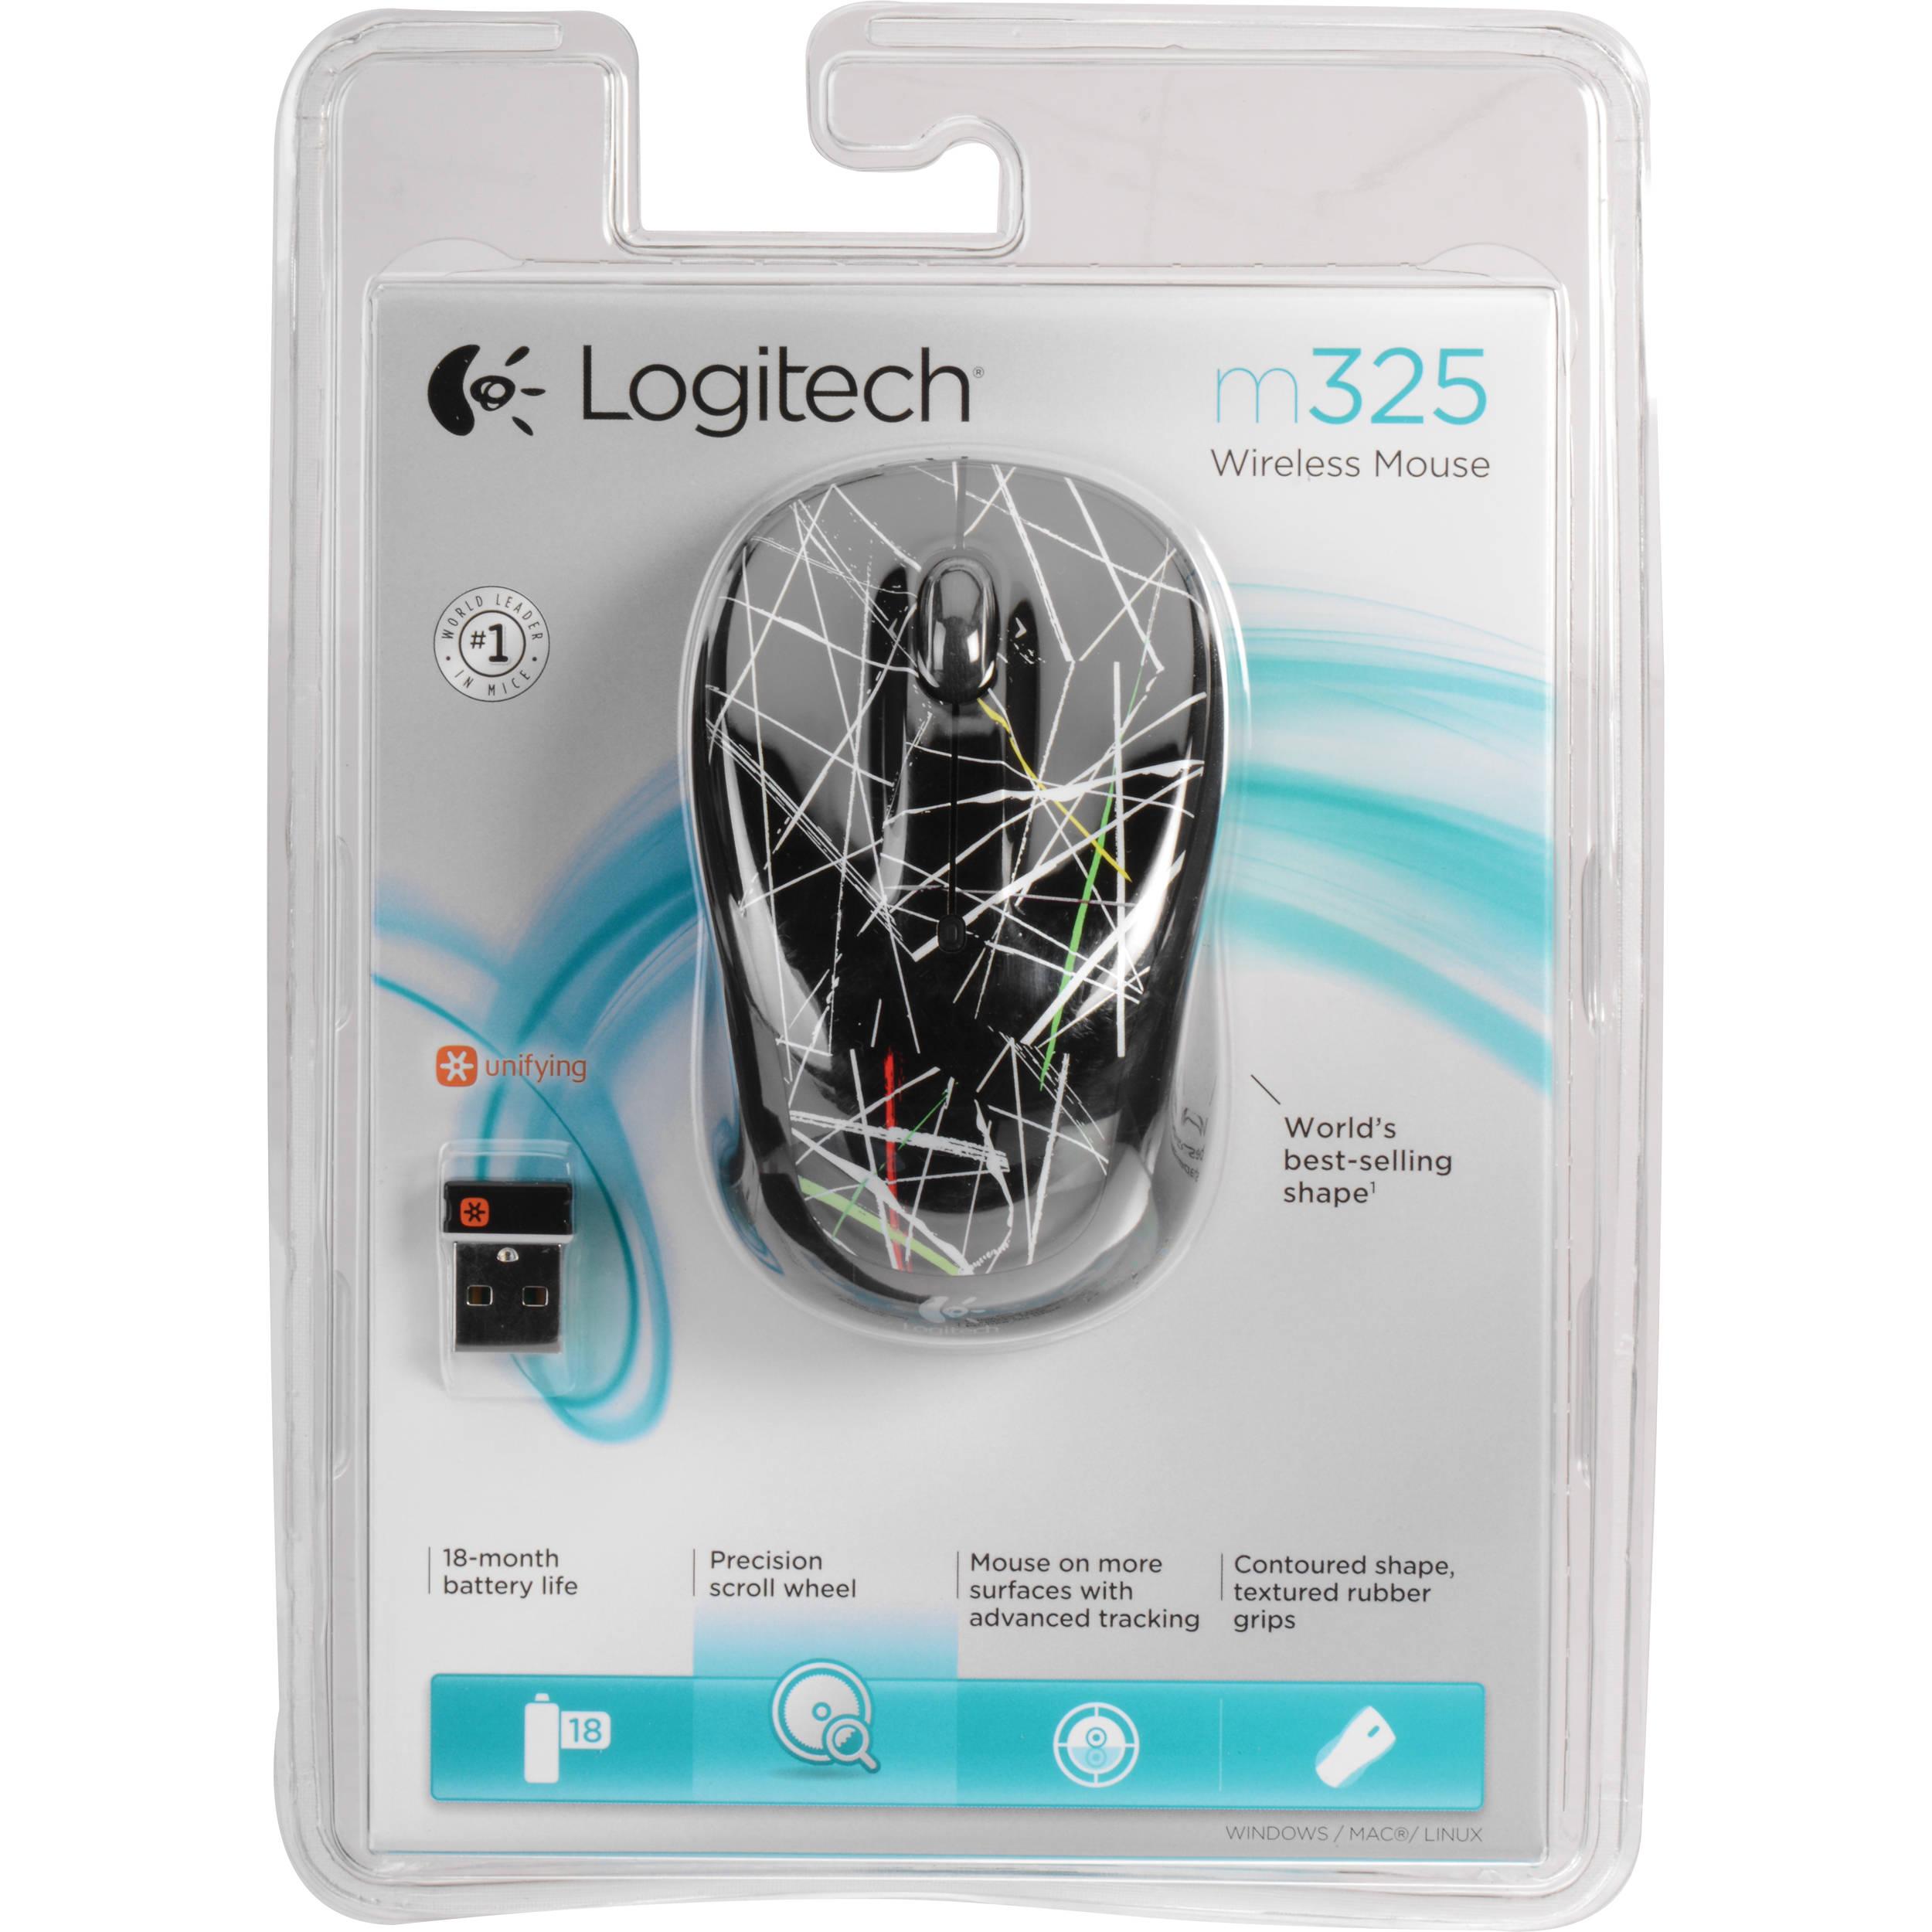 Logitech Wireless Mouse M325 (Laser Show)